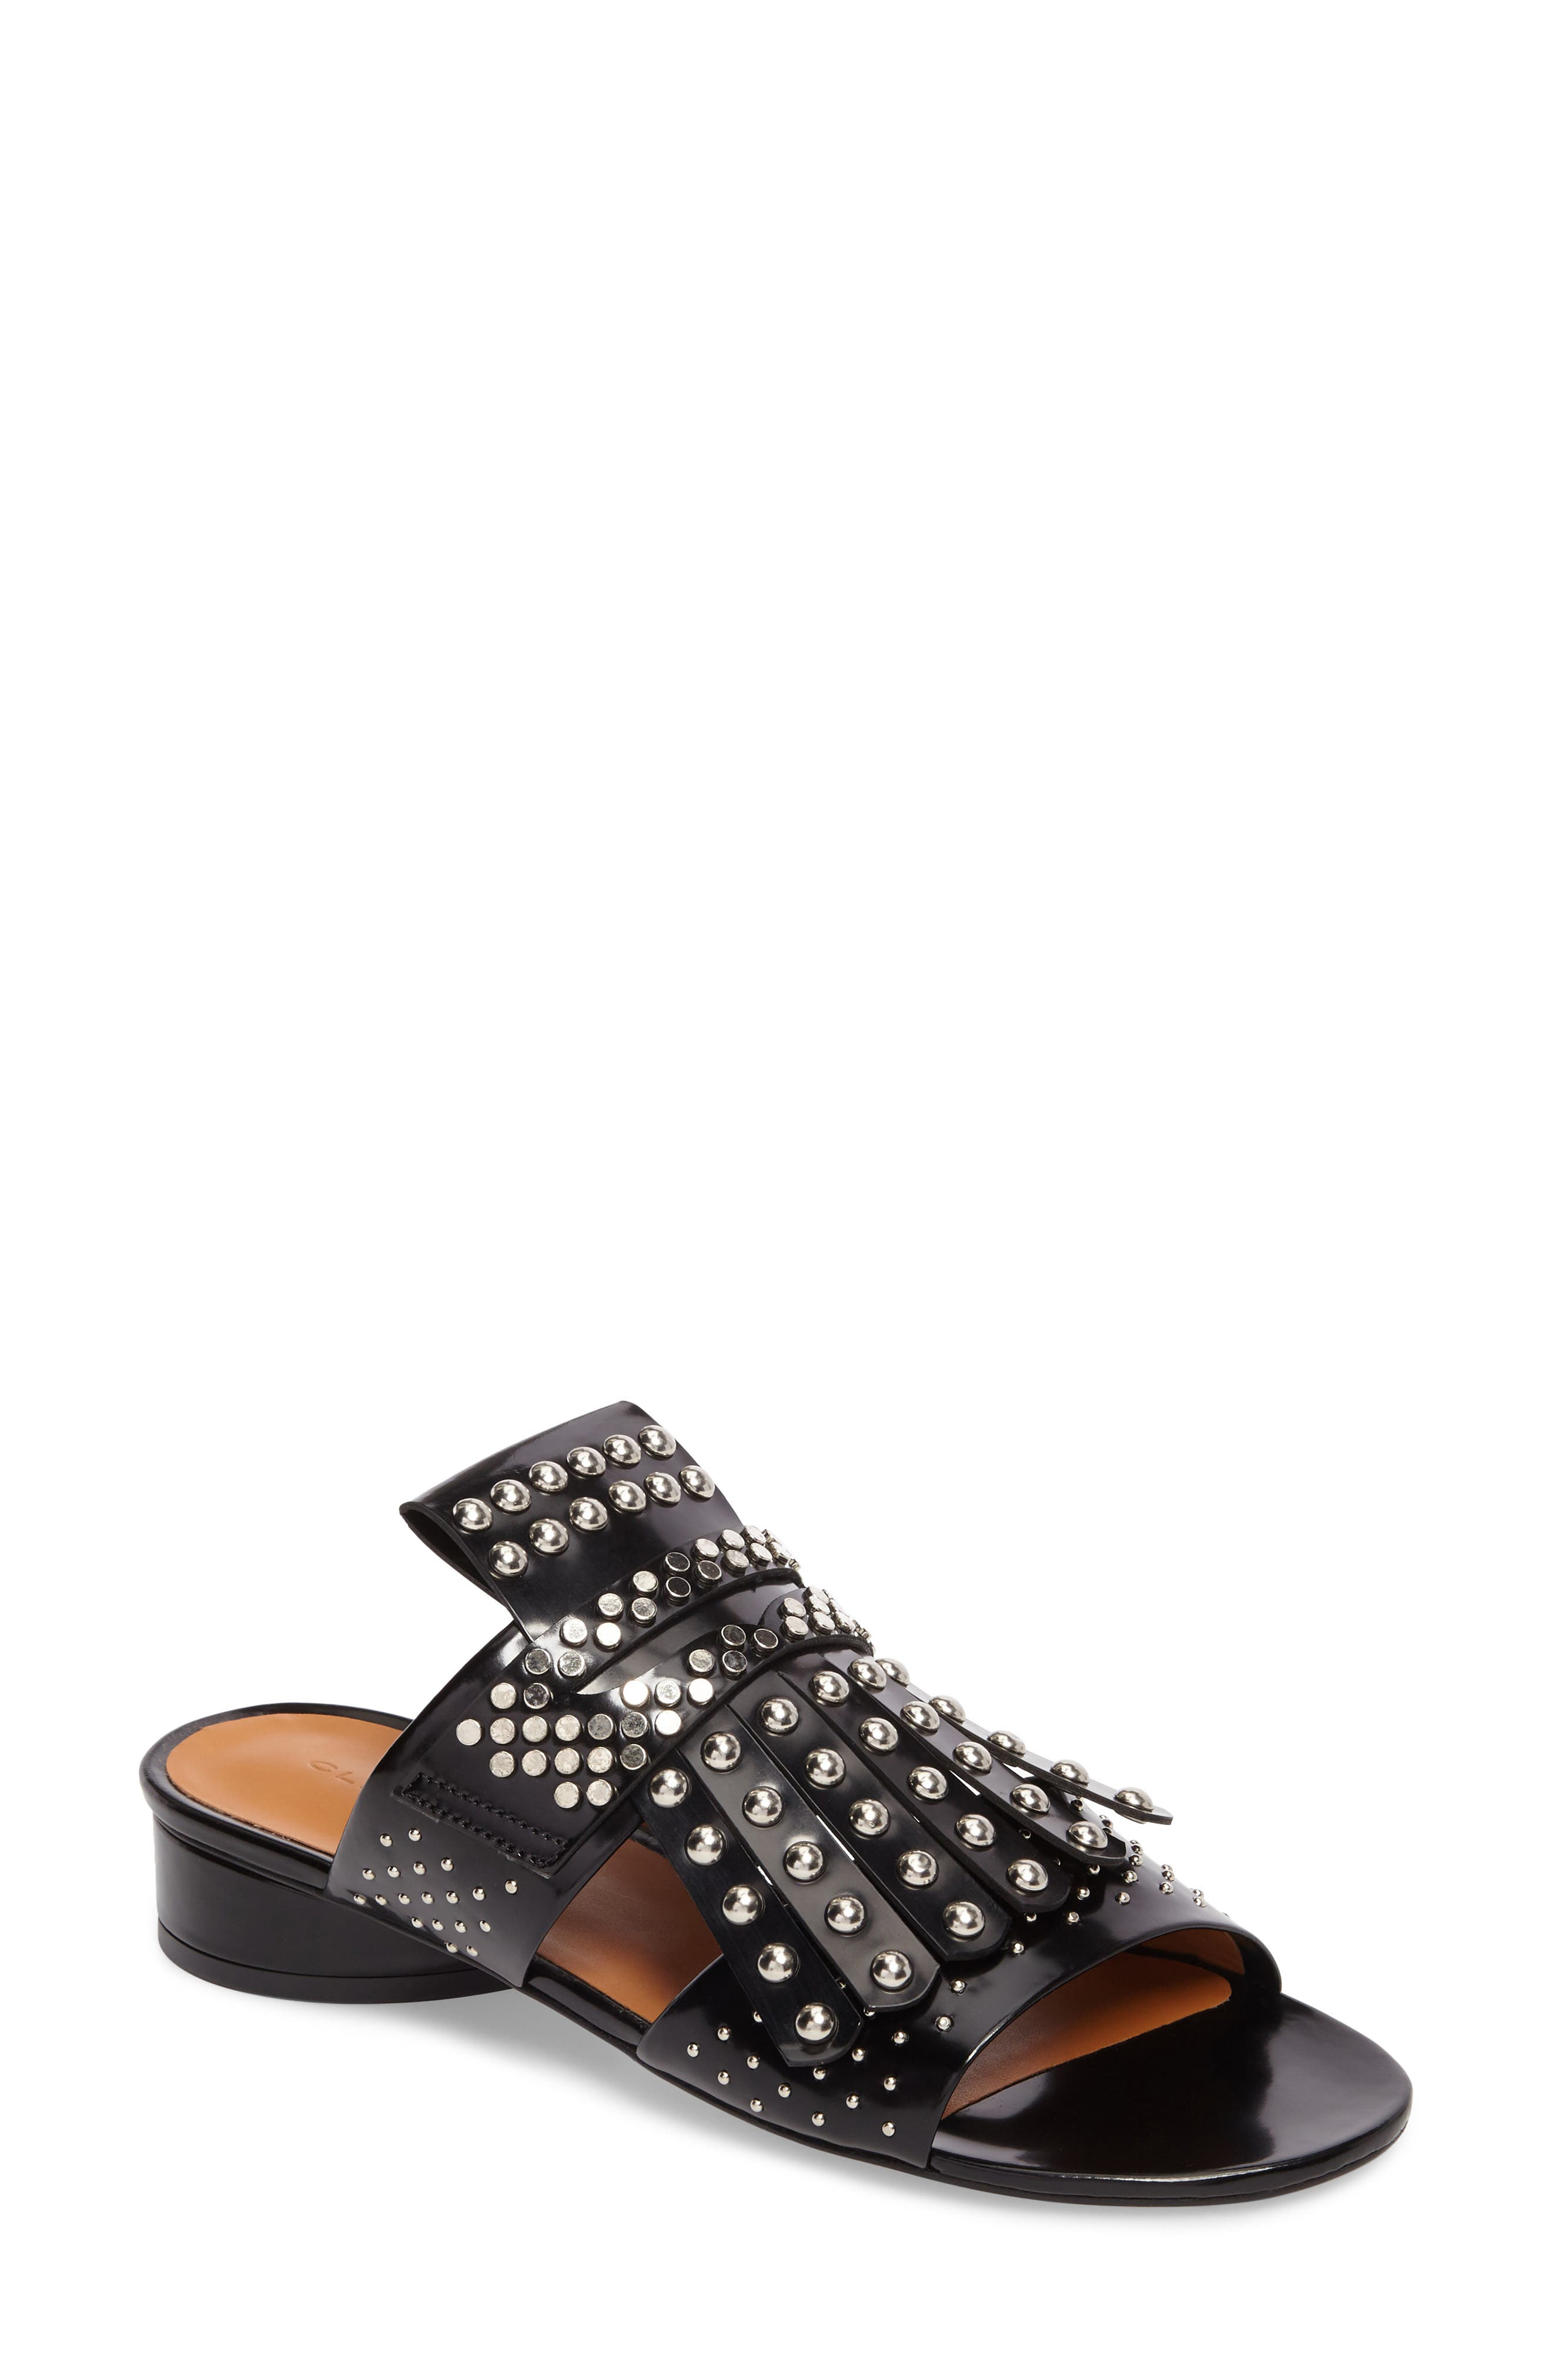 Figlouc Studded Sandal,                         Main,                         color, 001